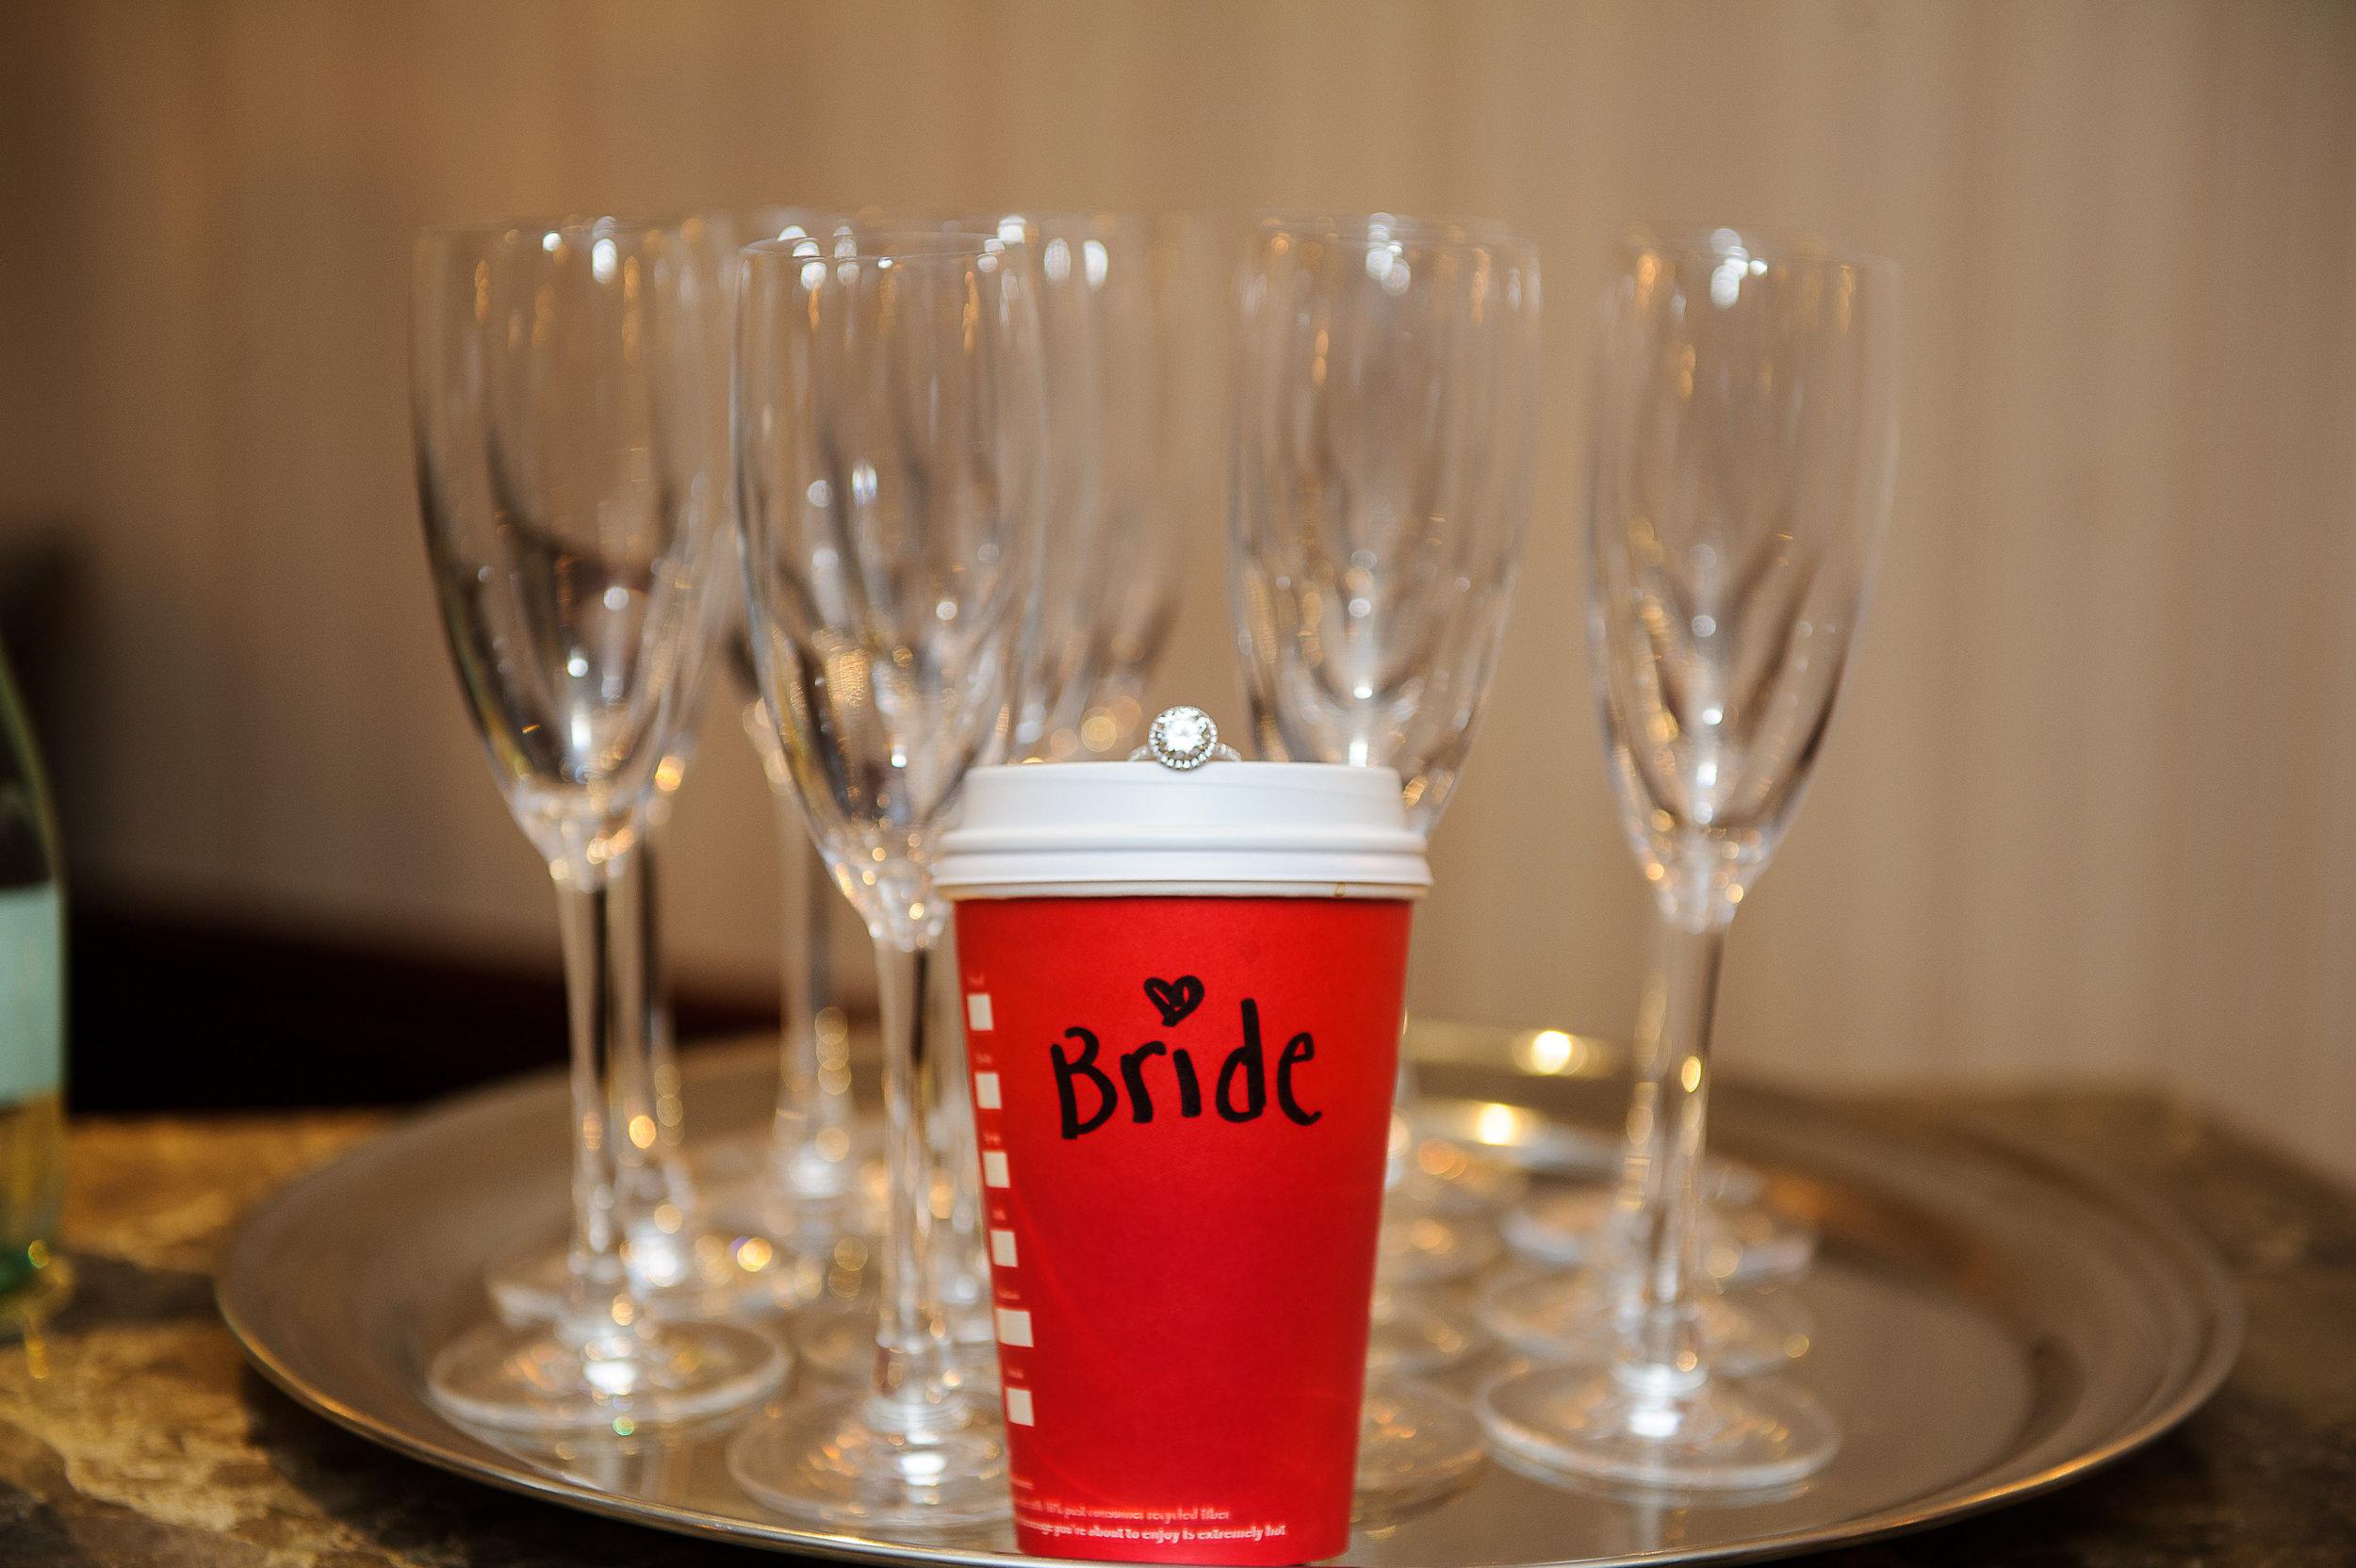 Ceci_New_York_Custom_Invitation_ New_Jersey_Wedding_Luxury_Personalized_Ceci_Style_Bride_Foil_Stamping79.JPG